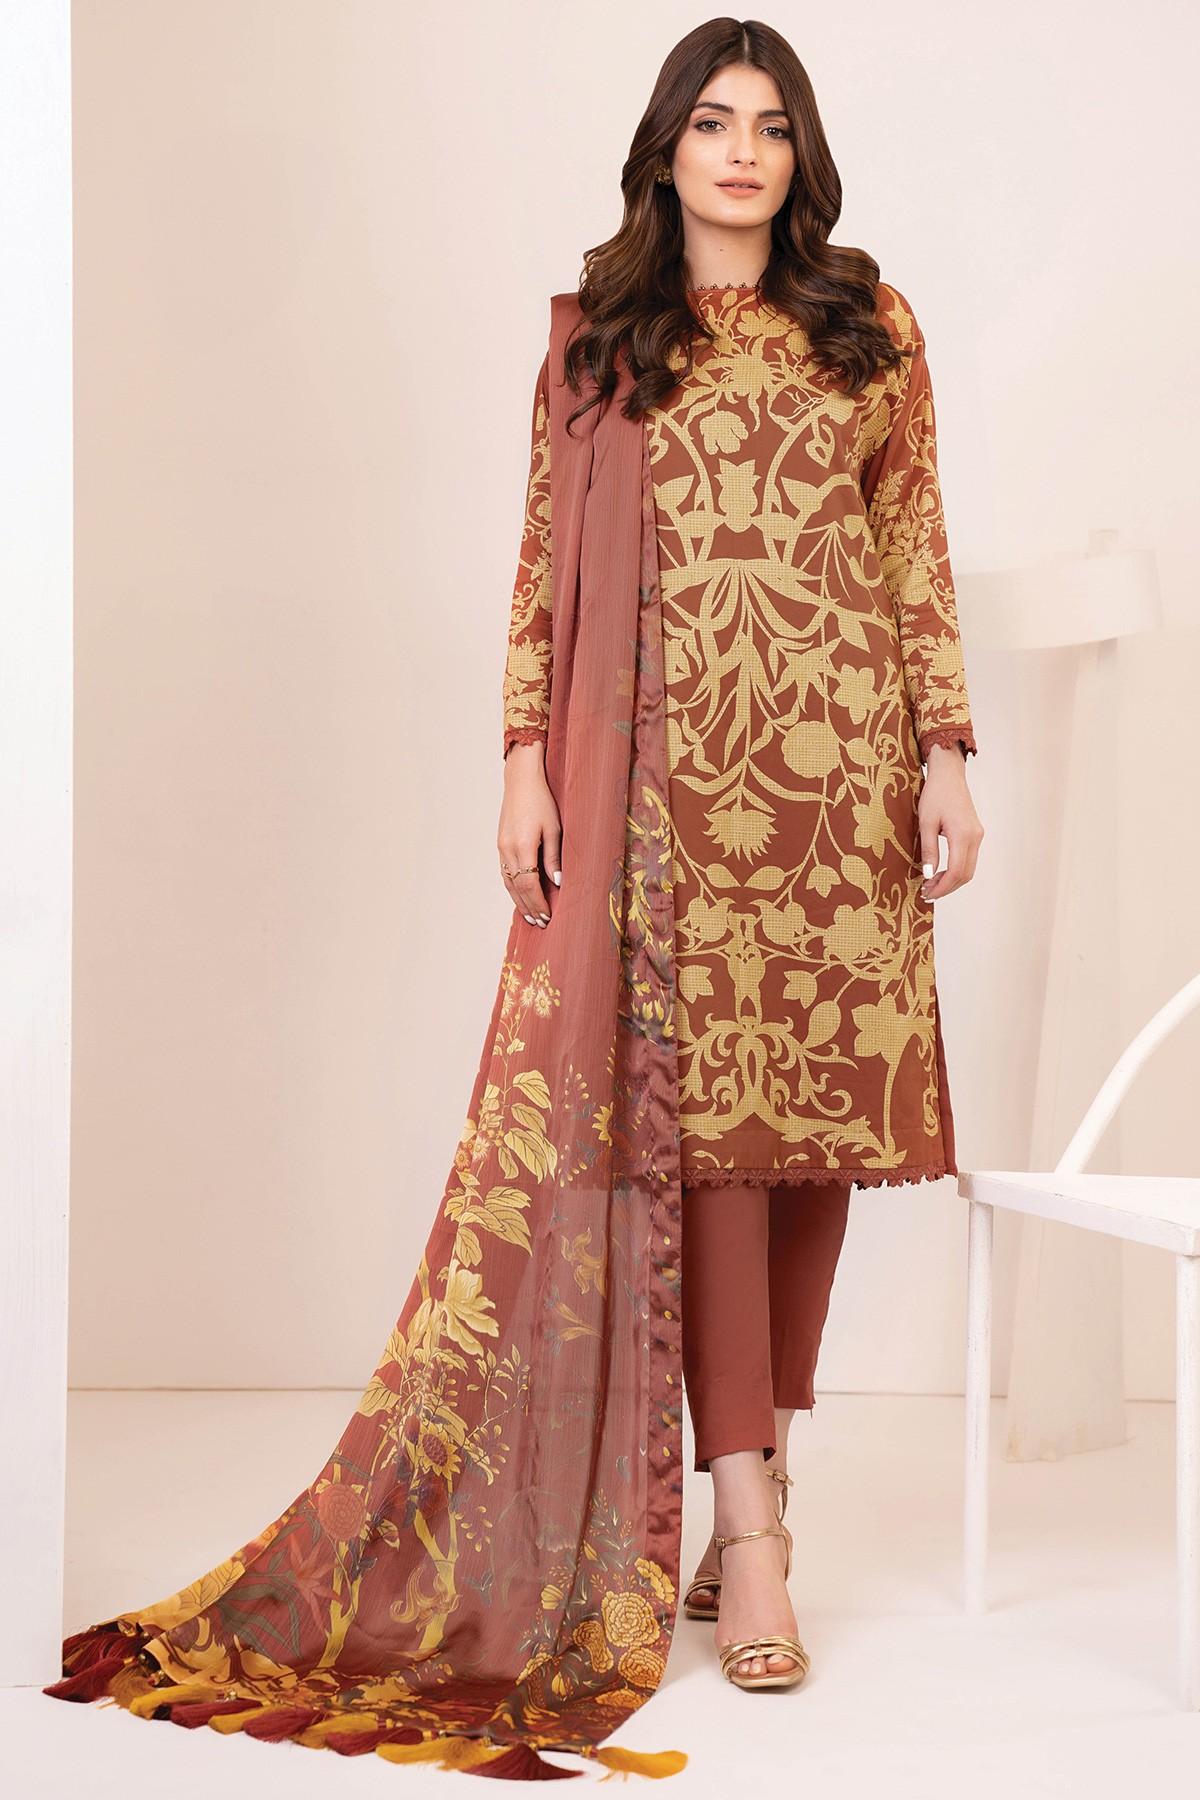 Al-Akaram winter collection Rust color Three Piece Cotton Satin Suit With Digital Silk Dupatta